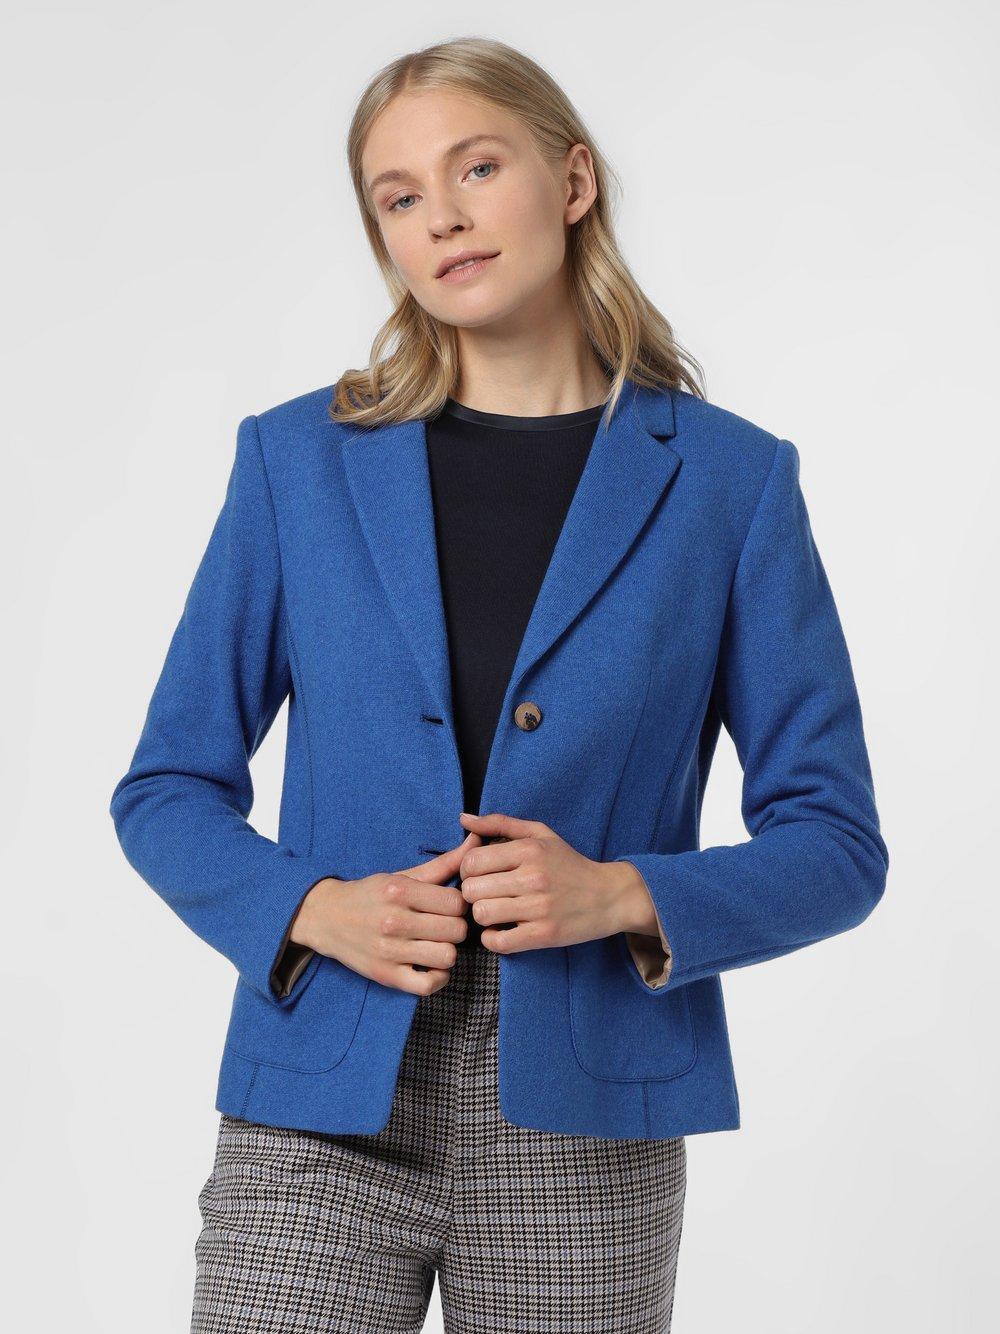 Rofa – Blezer damski, niebieski Van Graaf 488918-0003-00440